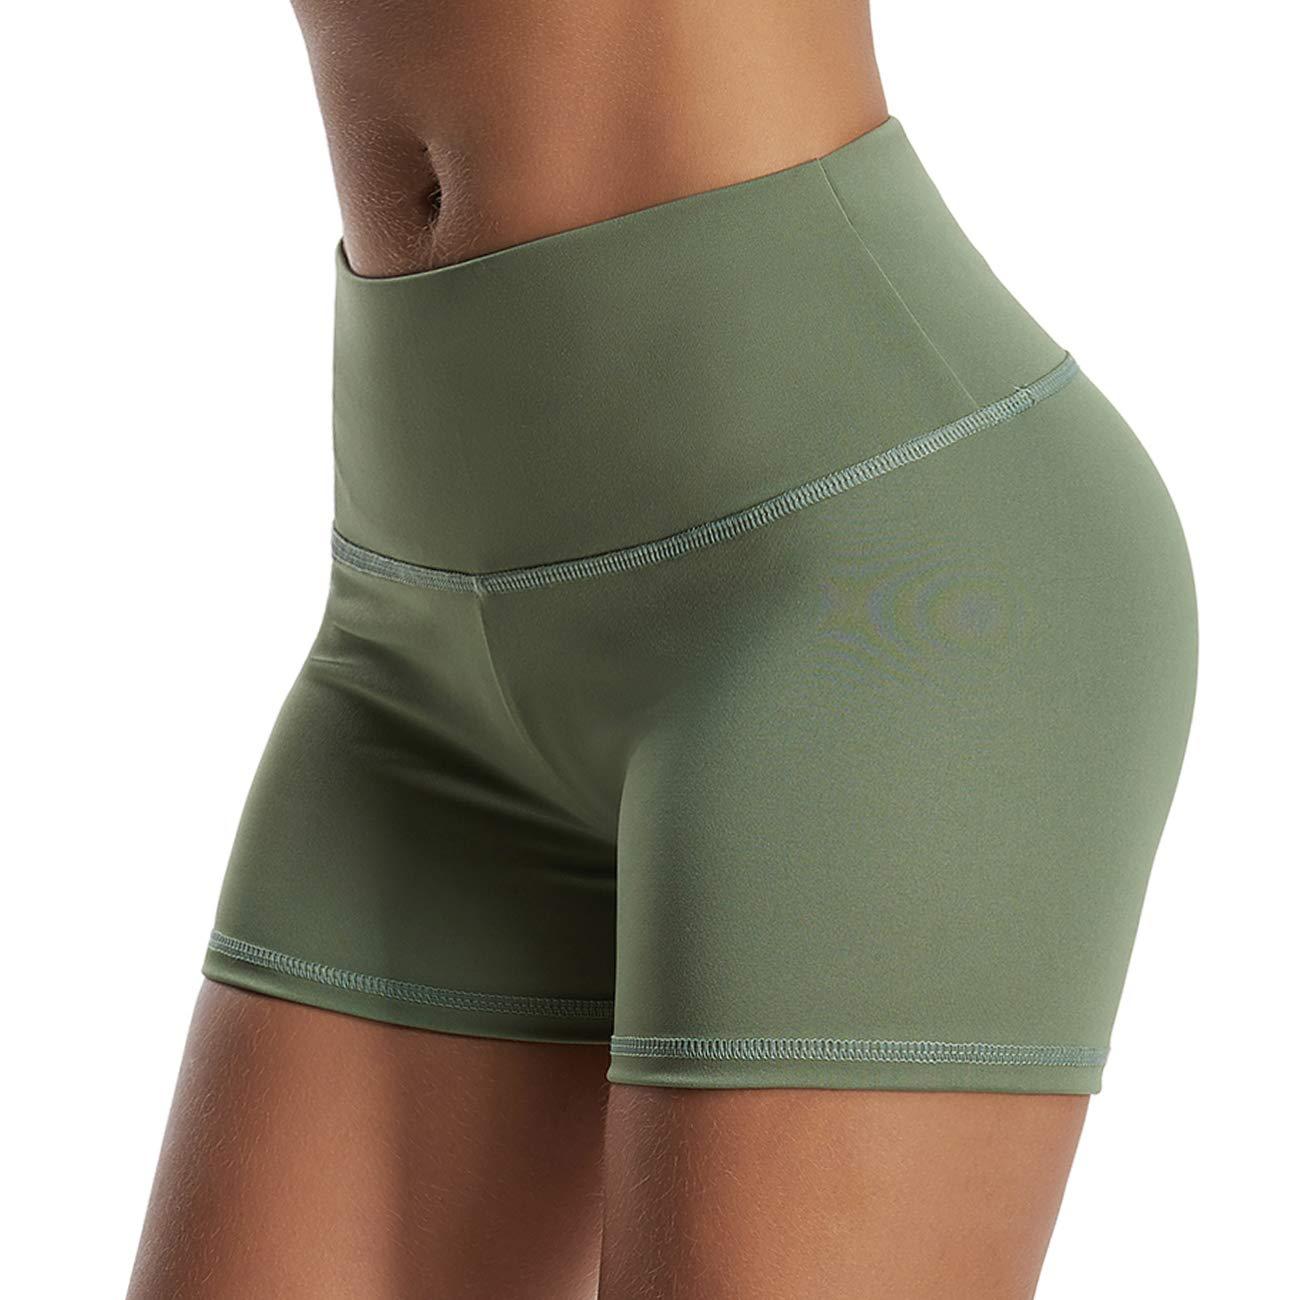 Stil 02Dunkelgreen L INSTINNCT Damen Kurze Trainingshose Sporthose Kurze Hose Sport Fitness Jogginghose Shorts